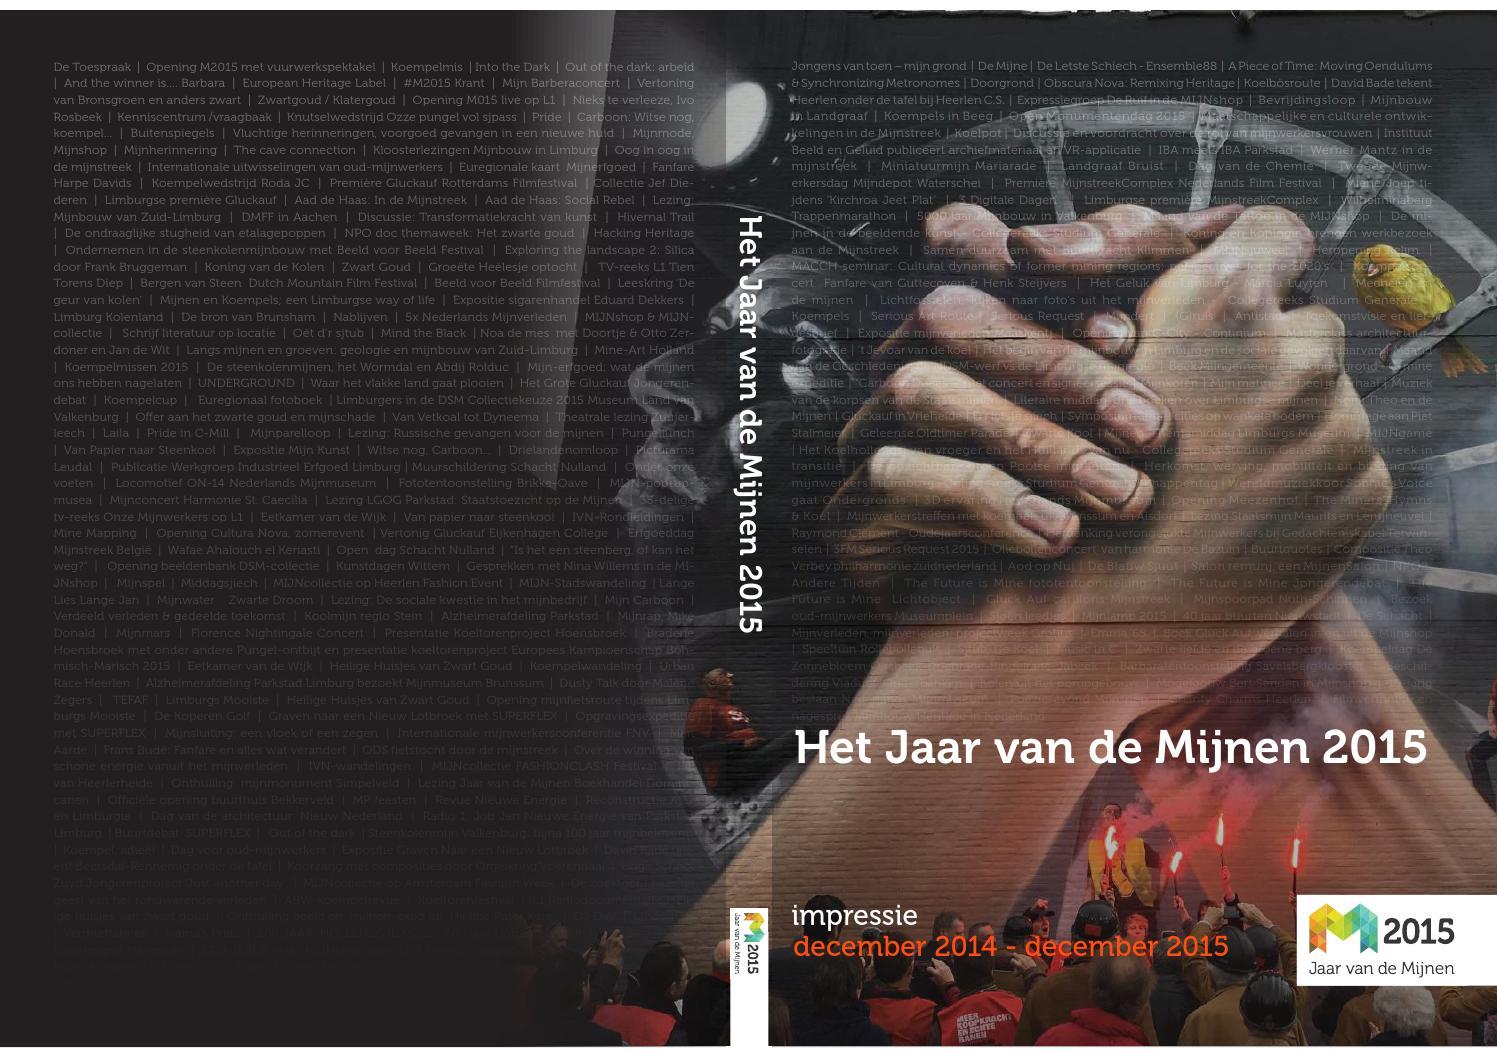 Jaar van de Mijnen 2015 (M2015) by Jaar van de Mijnen 2015 (M2015 ...